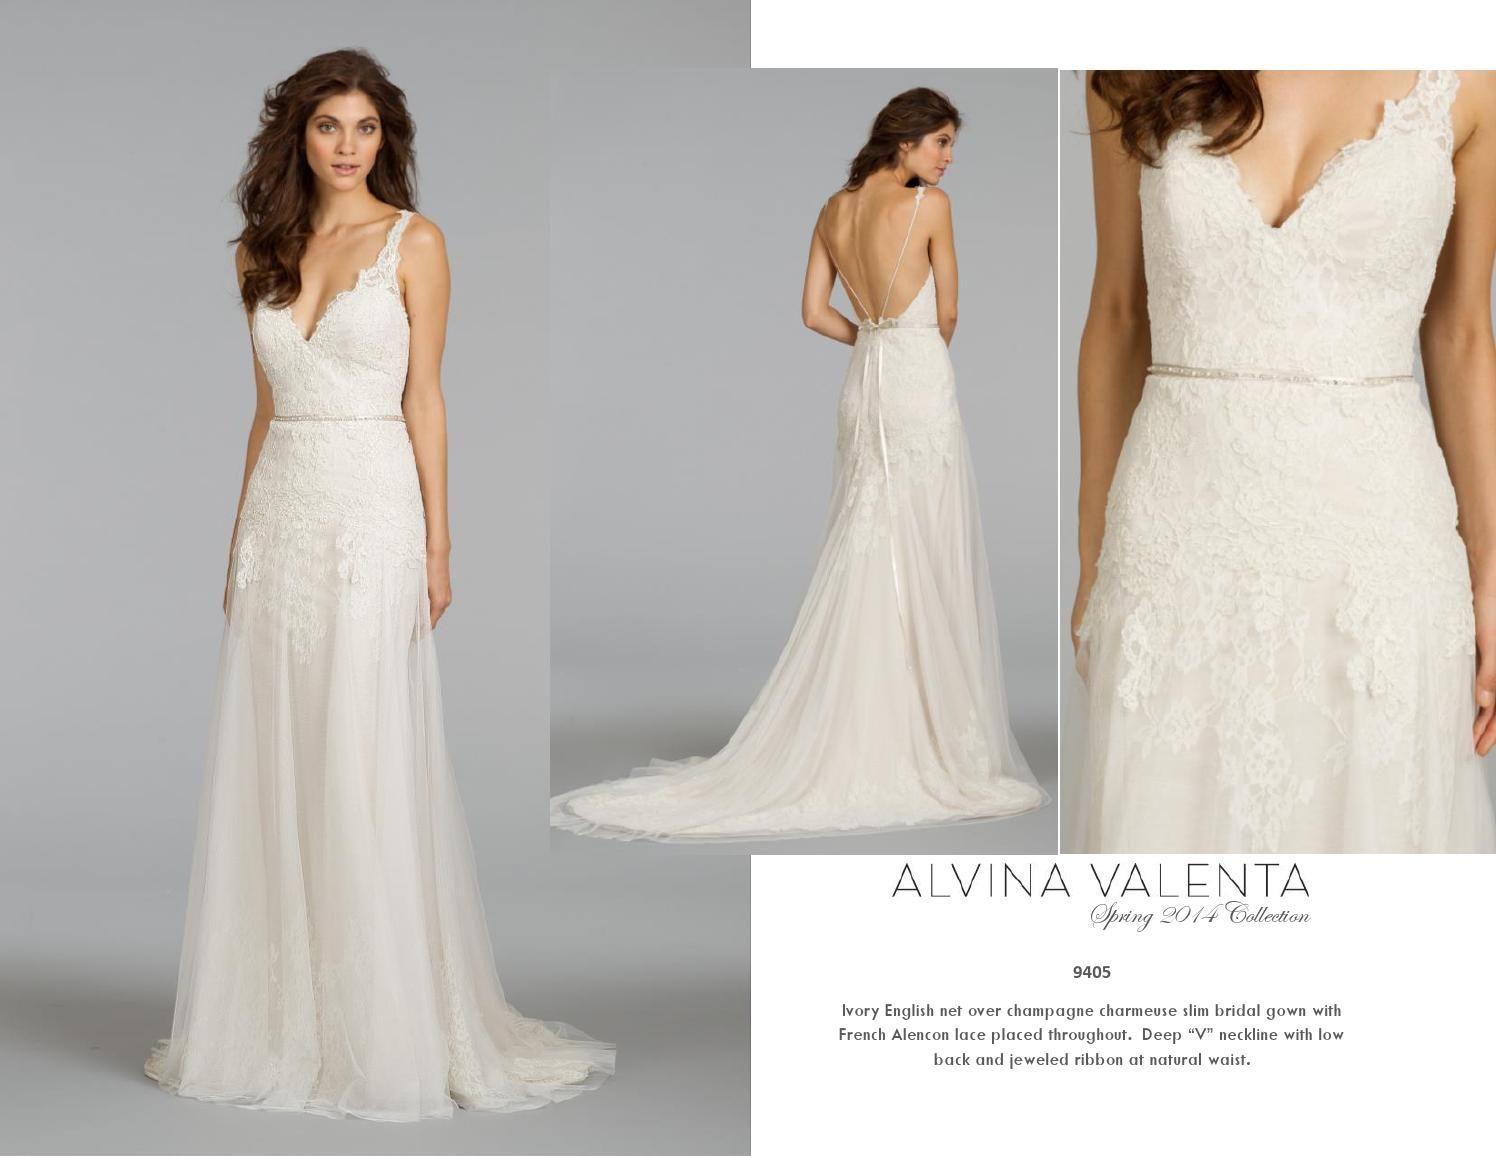 Alvina Valenta Spring 2014 Bridal Gown Collection – Part 4 Alvina Valenta Spring 2014 Bridal Gown Collection – Part 4 new photo